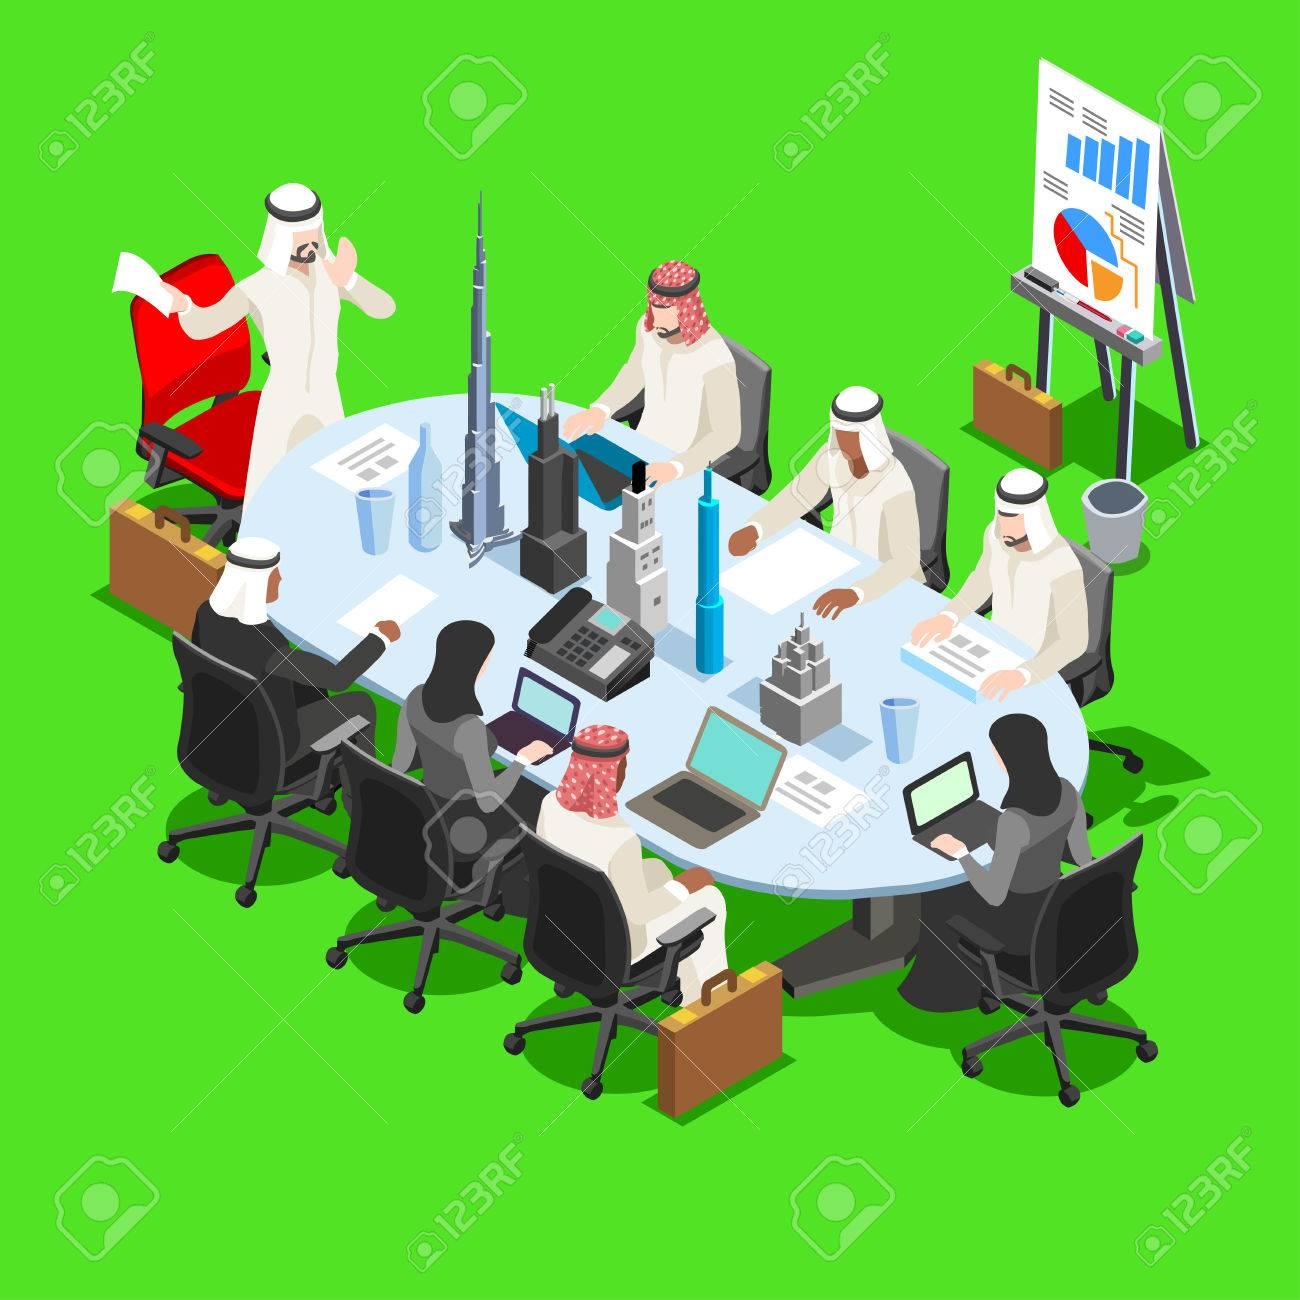 Middle Eastern Arab Sheik Businessman 3D Flat Isometric People